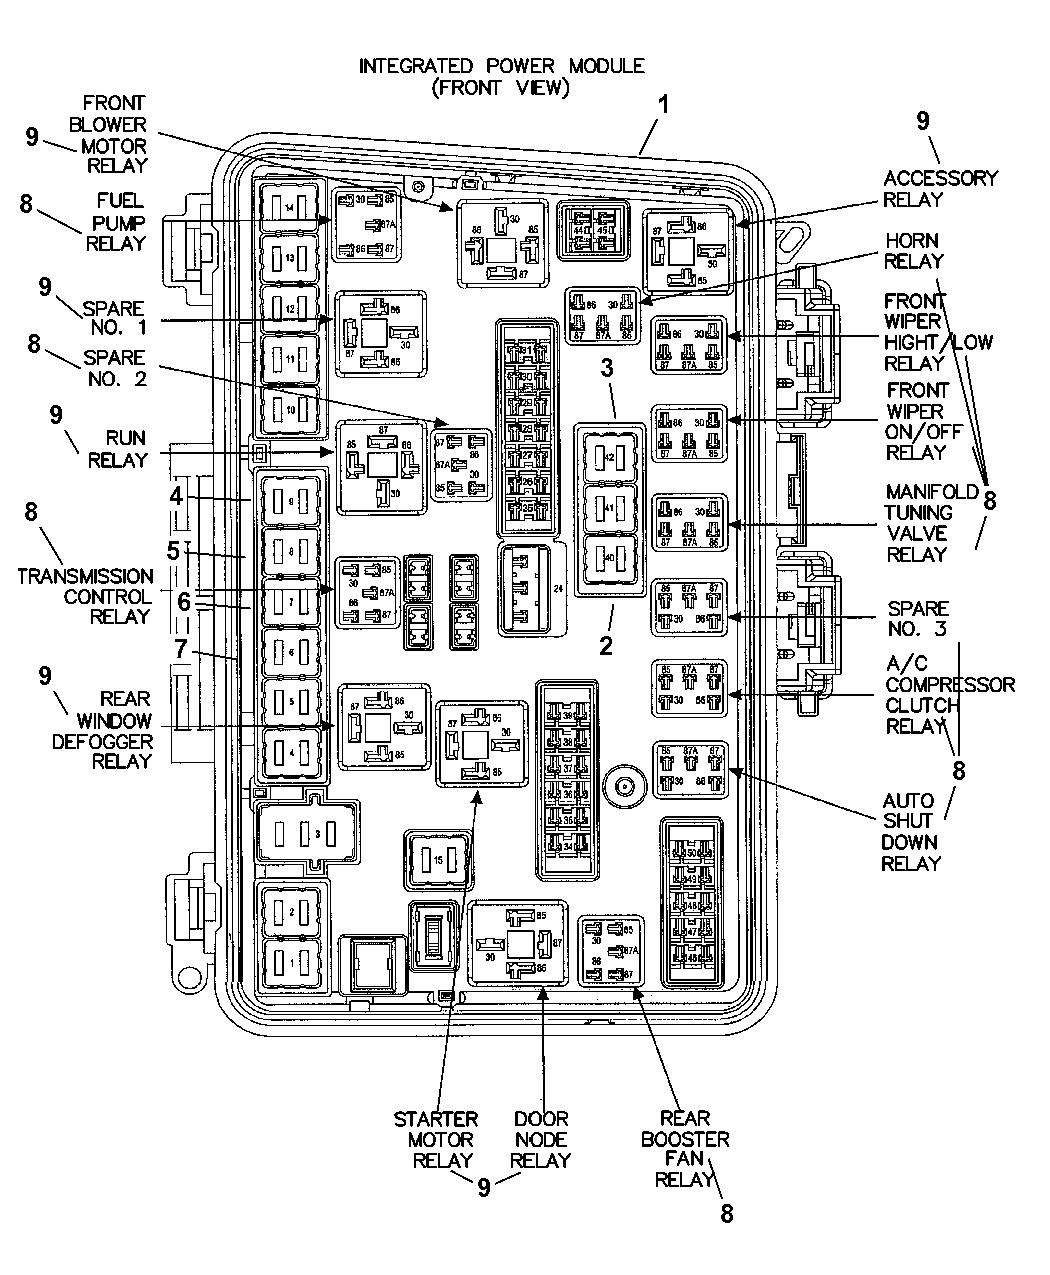 Honda Accord Radio Wiring Diagram Further 2007 Honda Accord Horn Relay